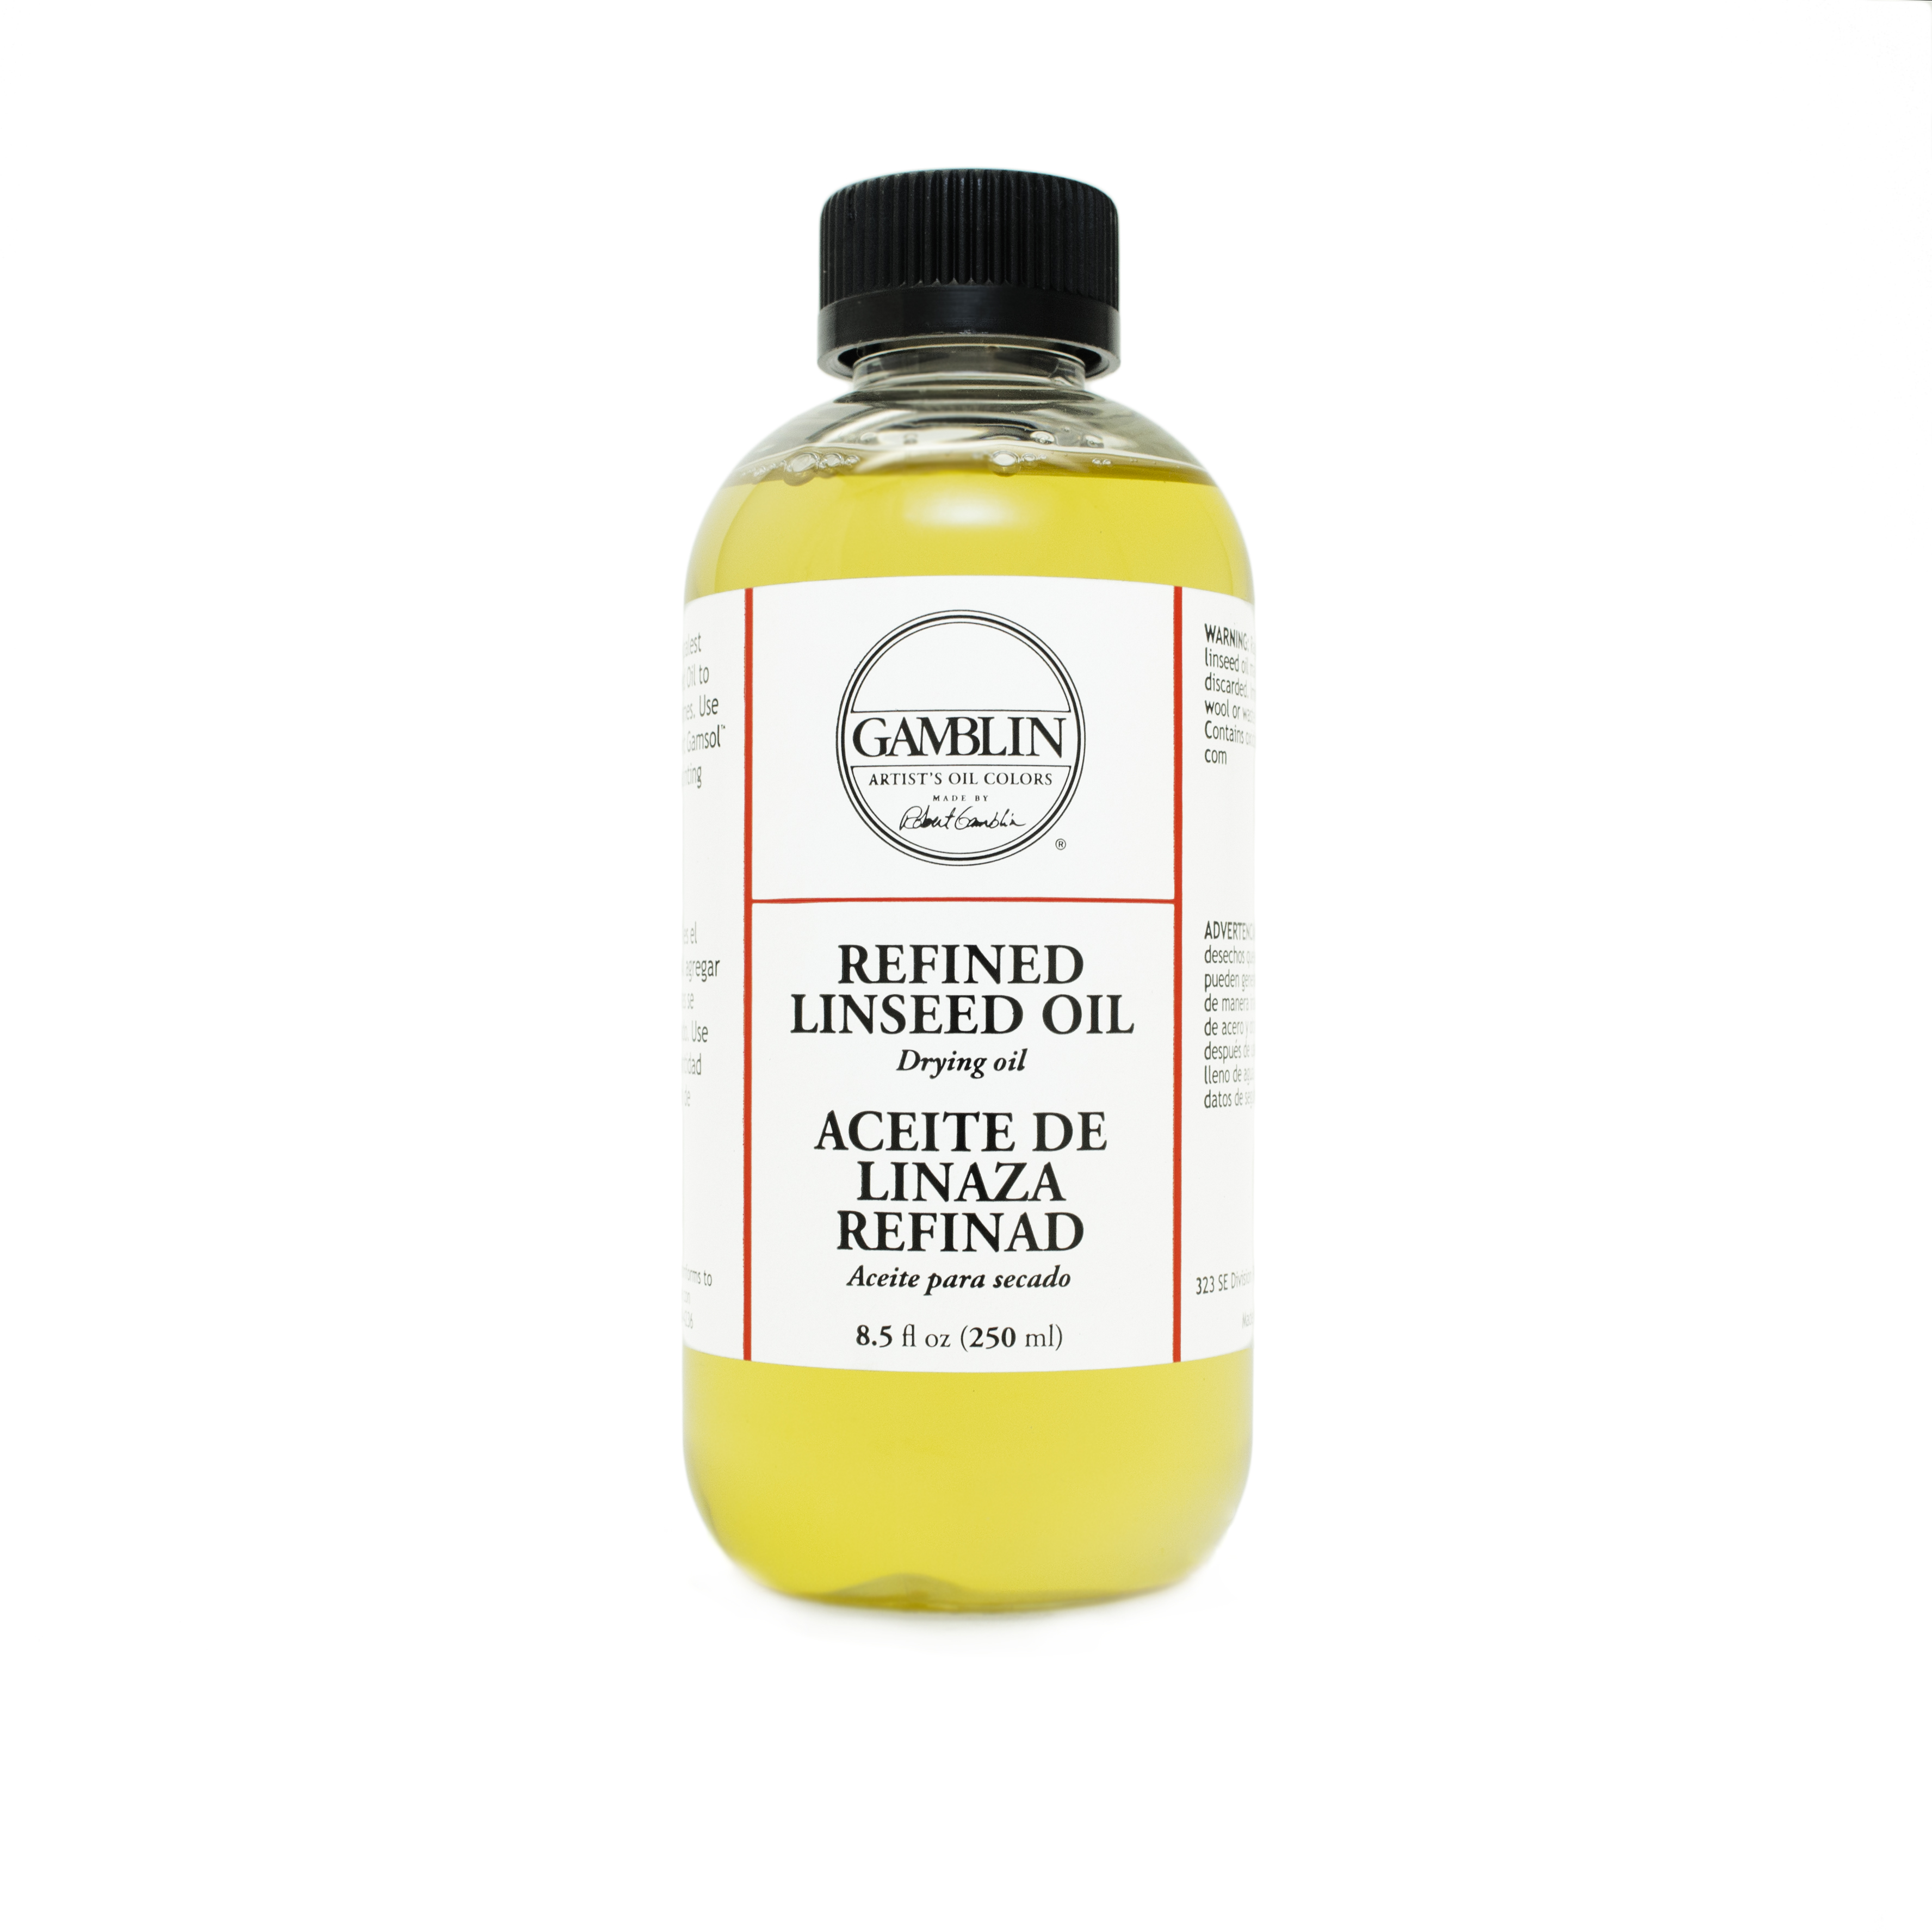 Gamblin Linseed Oil Refined Low Acid Ole Malmittel Peters